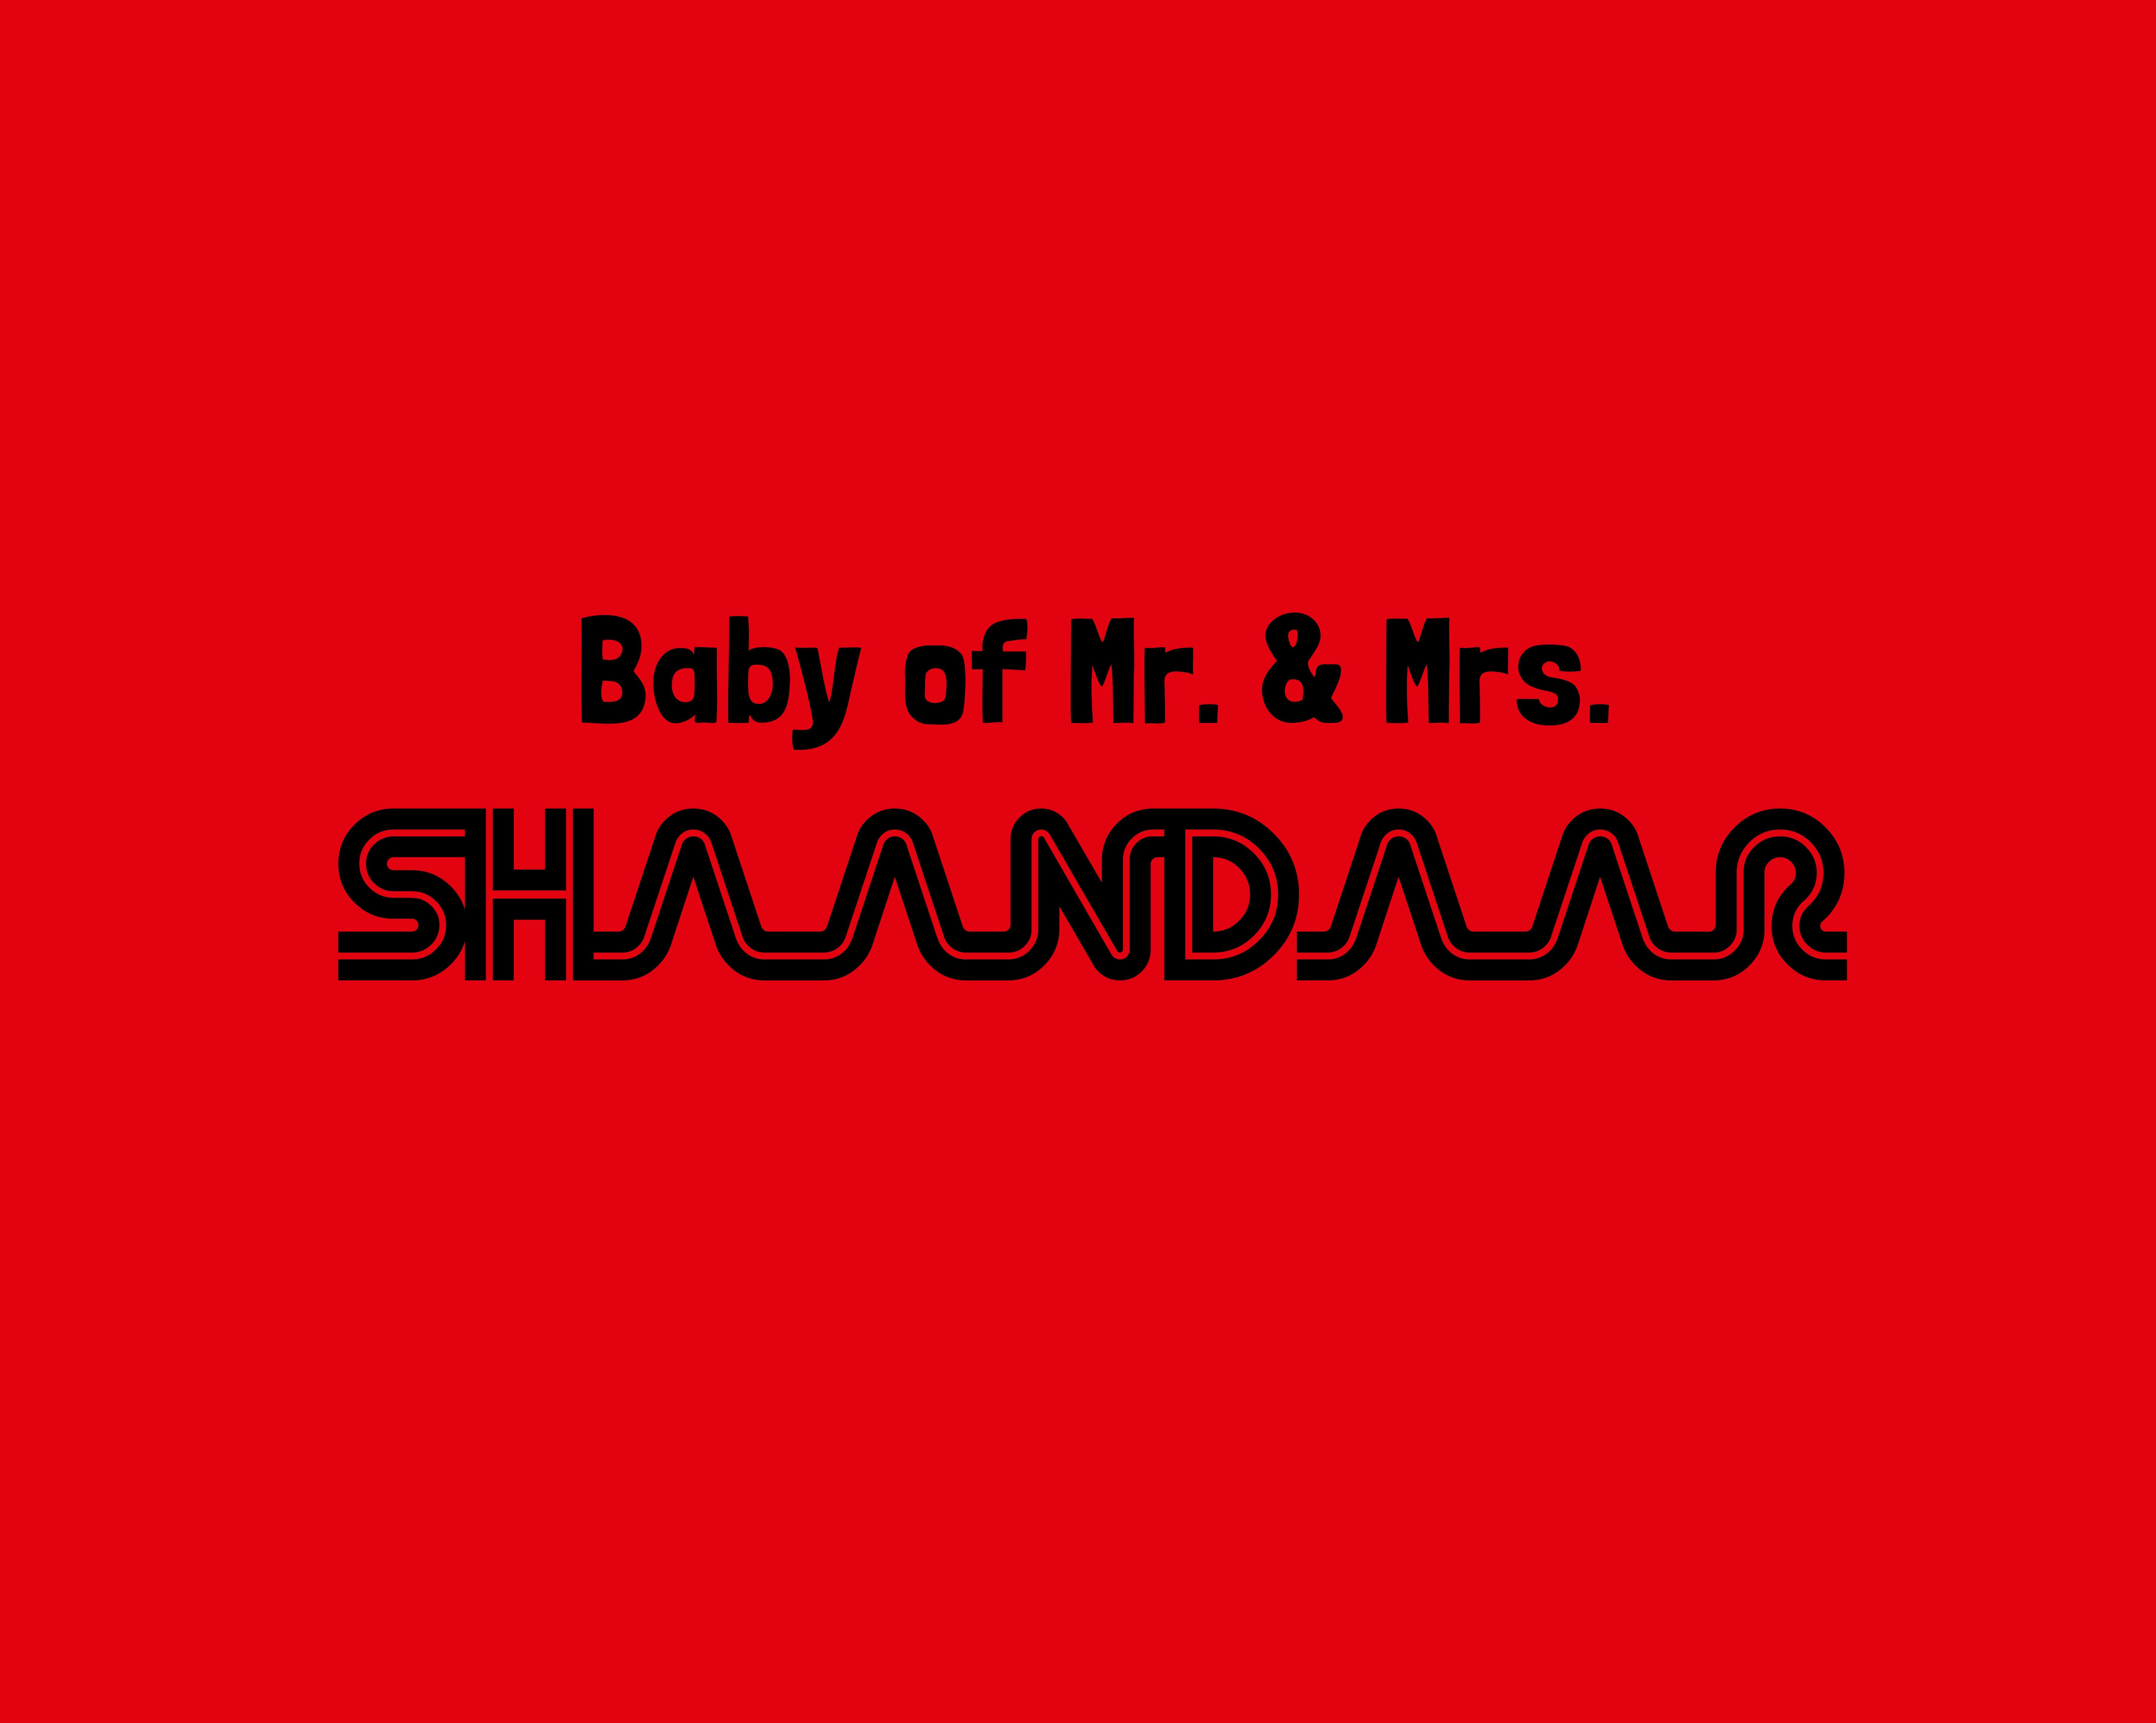 SHANDAAR-ROMPER